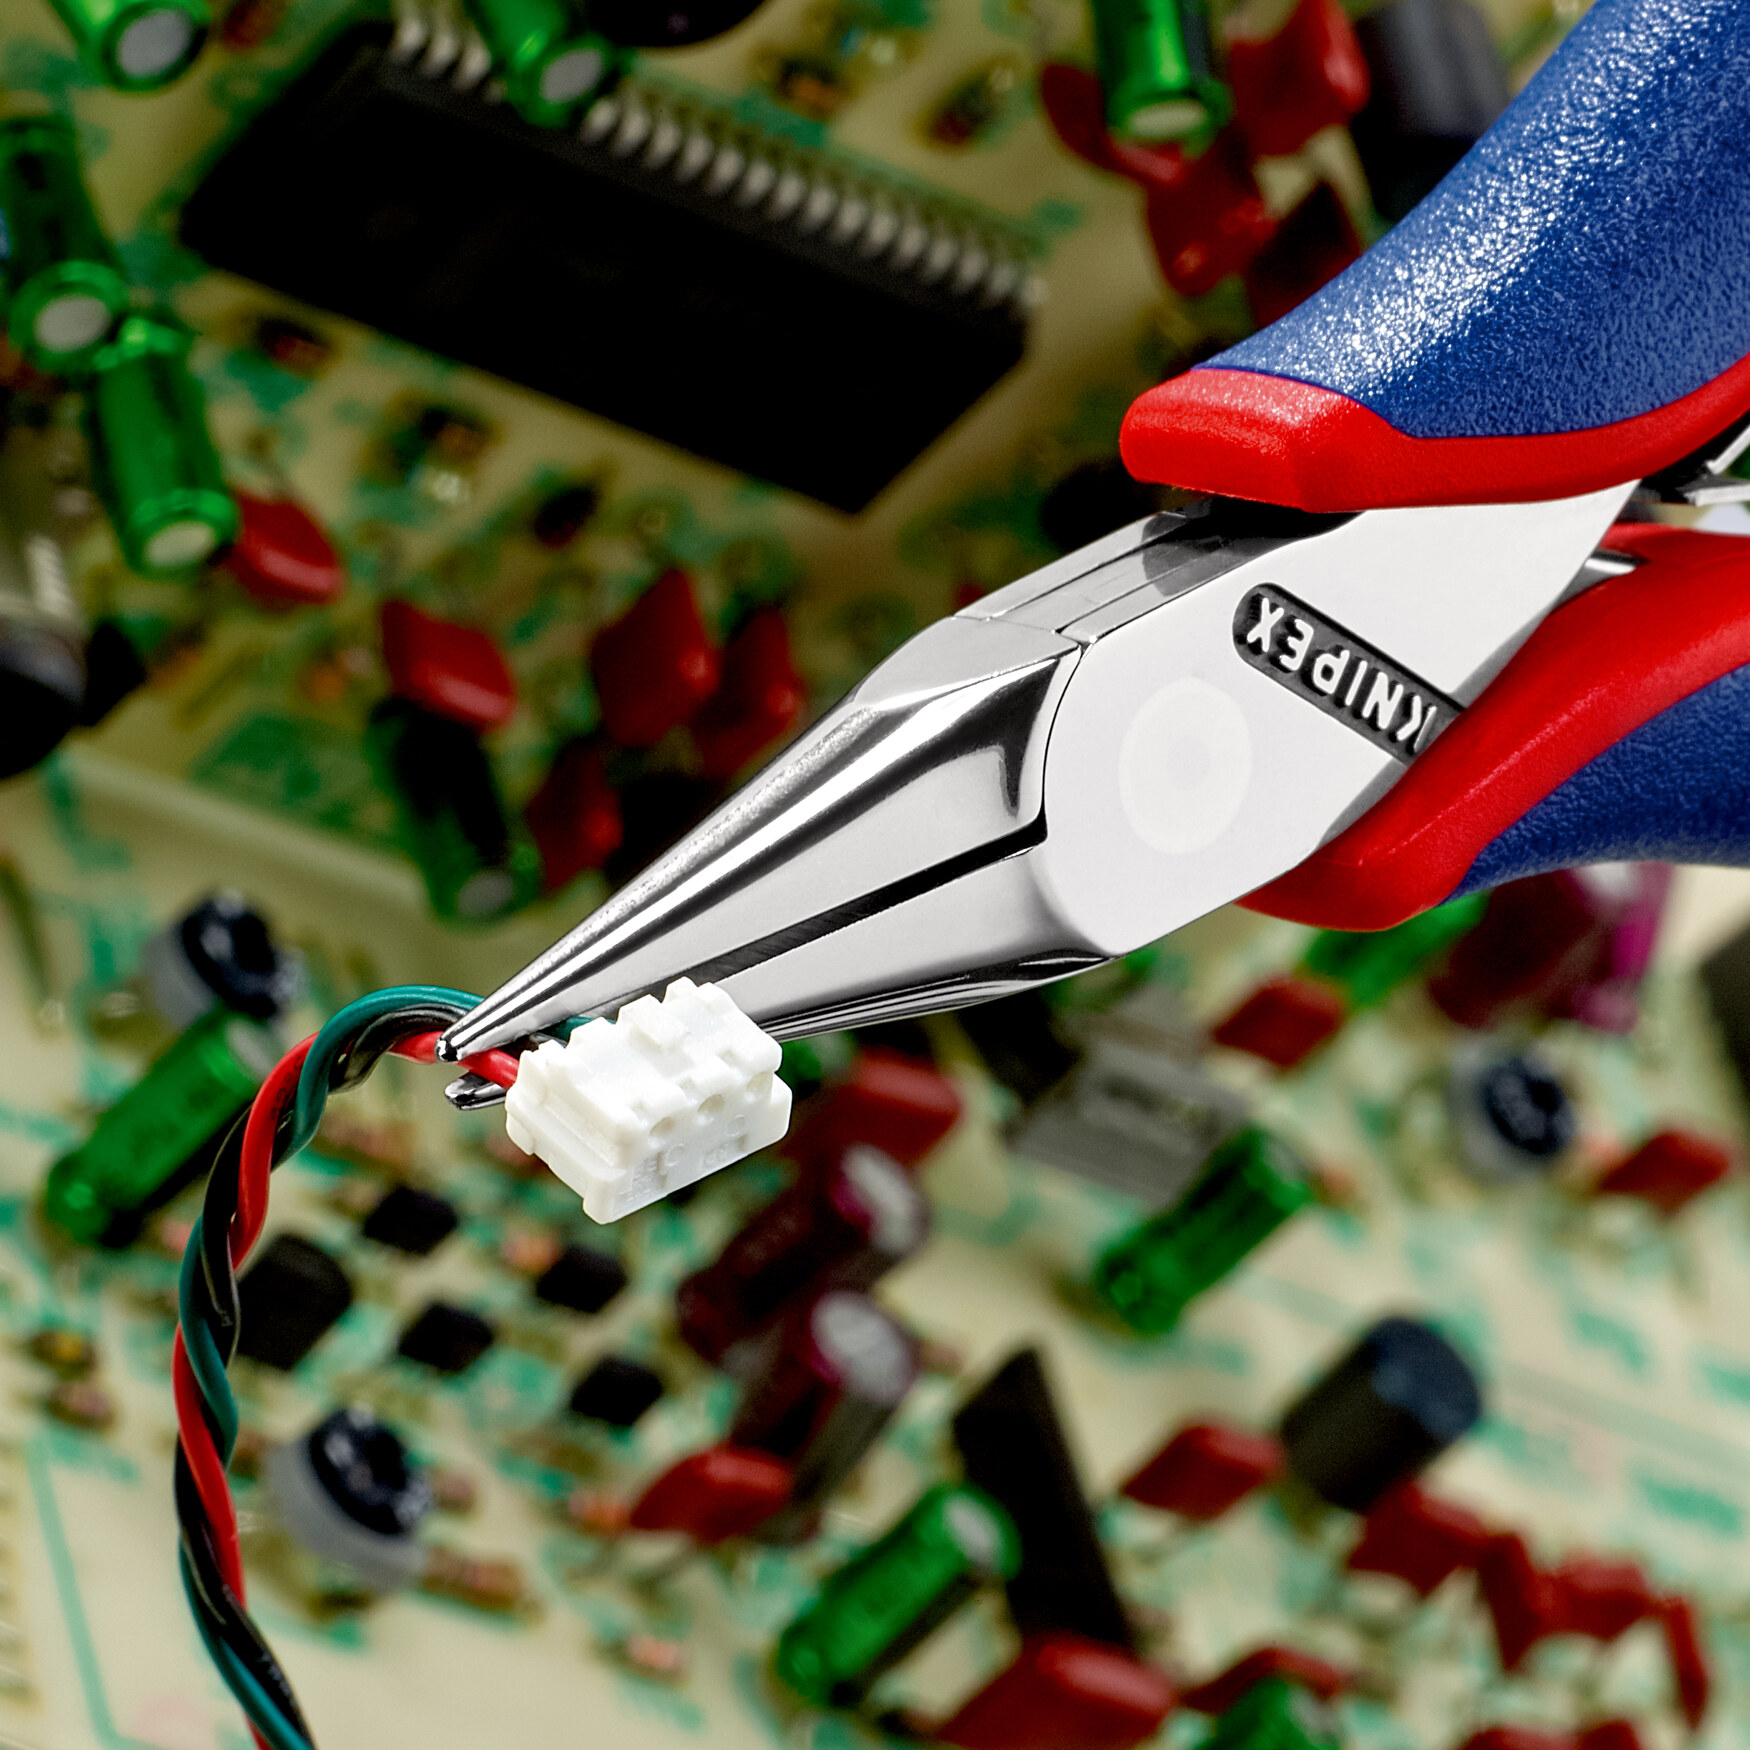 KNIPEX  Elektronik-Greifzange 115 mm 35 22 115 SB